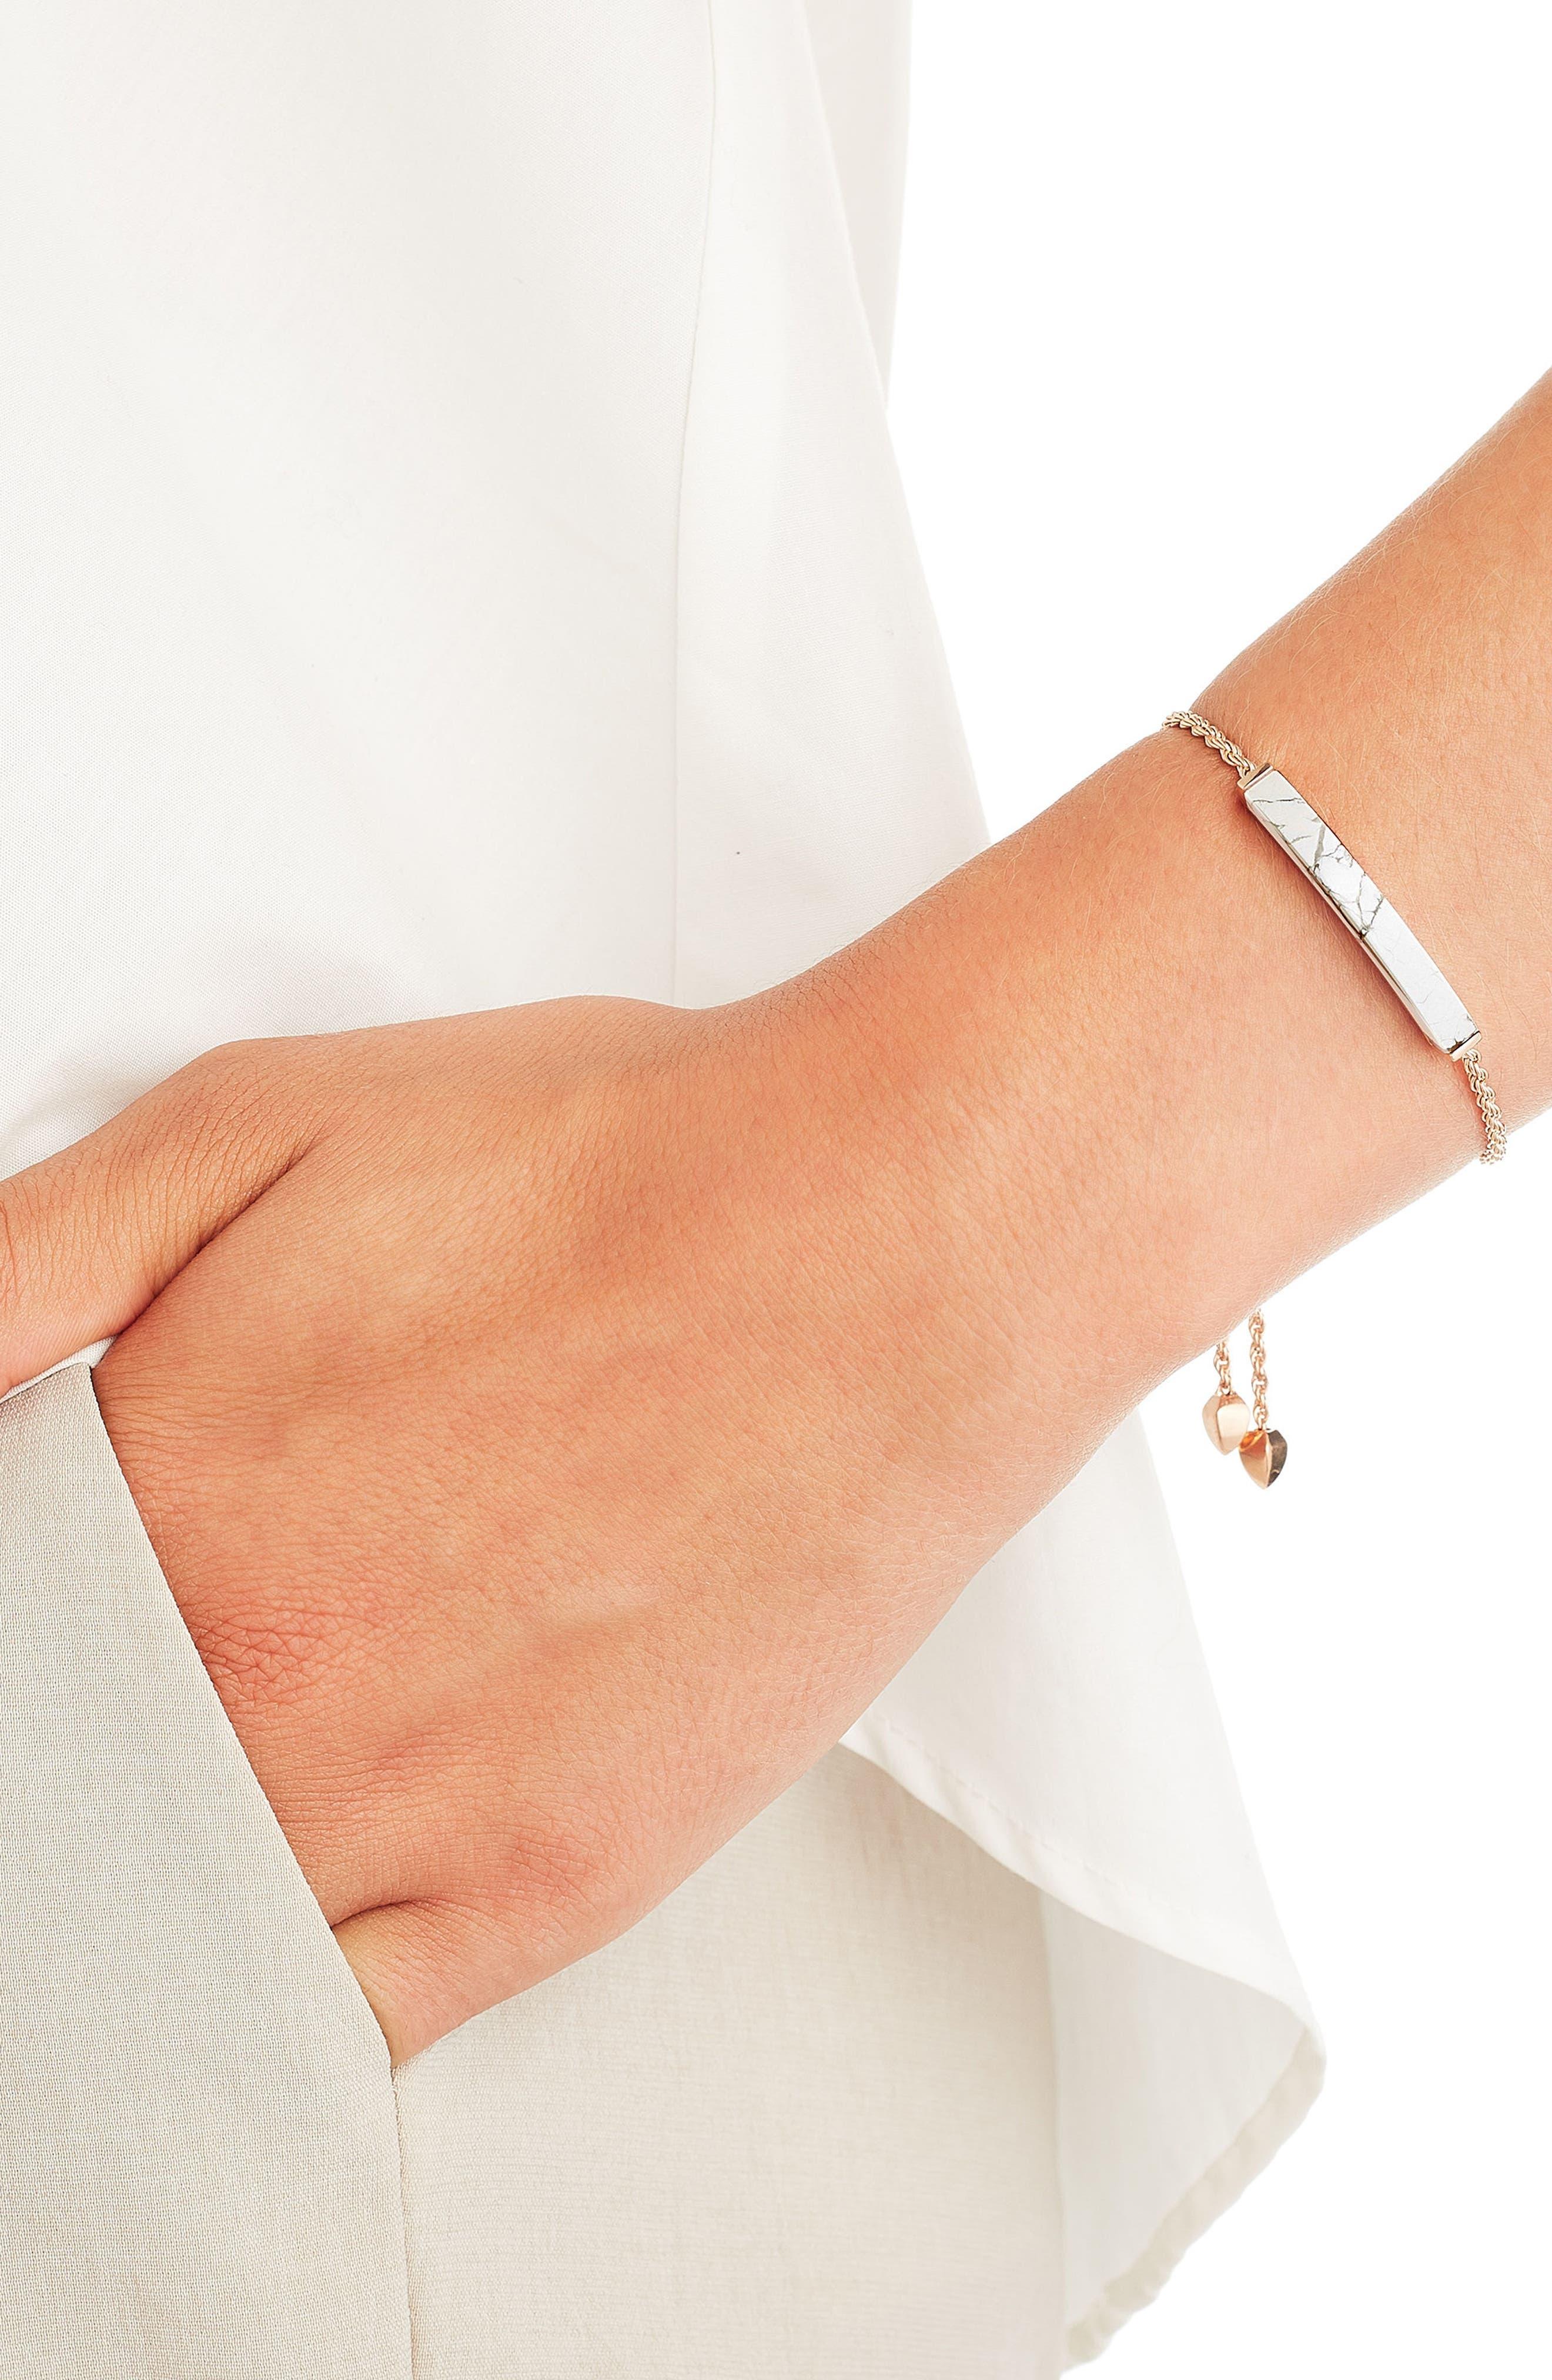 Engravable Linear Semiprecious Stone Friendship Bracelet,                             Alternate thumbnail 2, color,                             ROSE GOLD/ HOWLITE